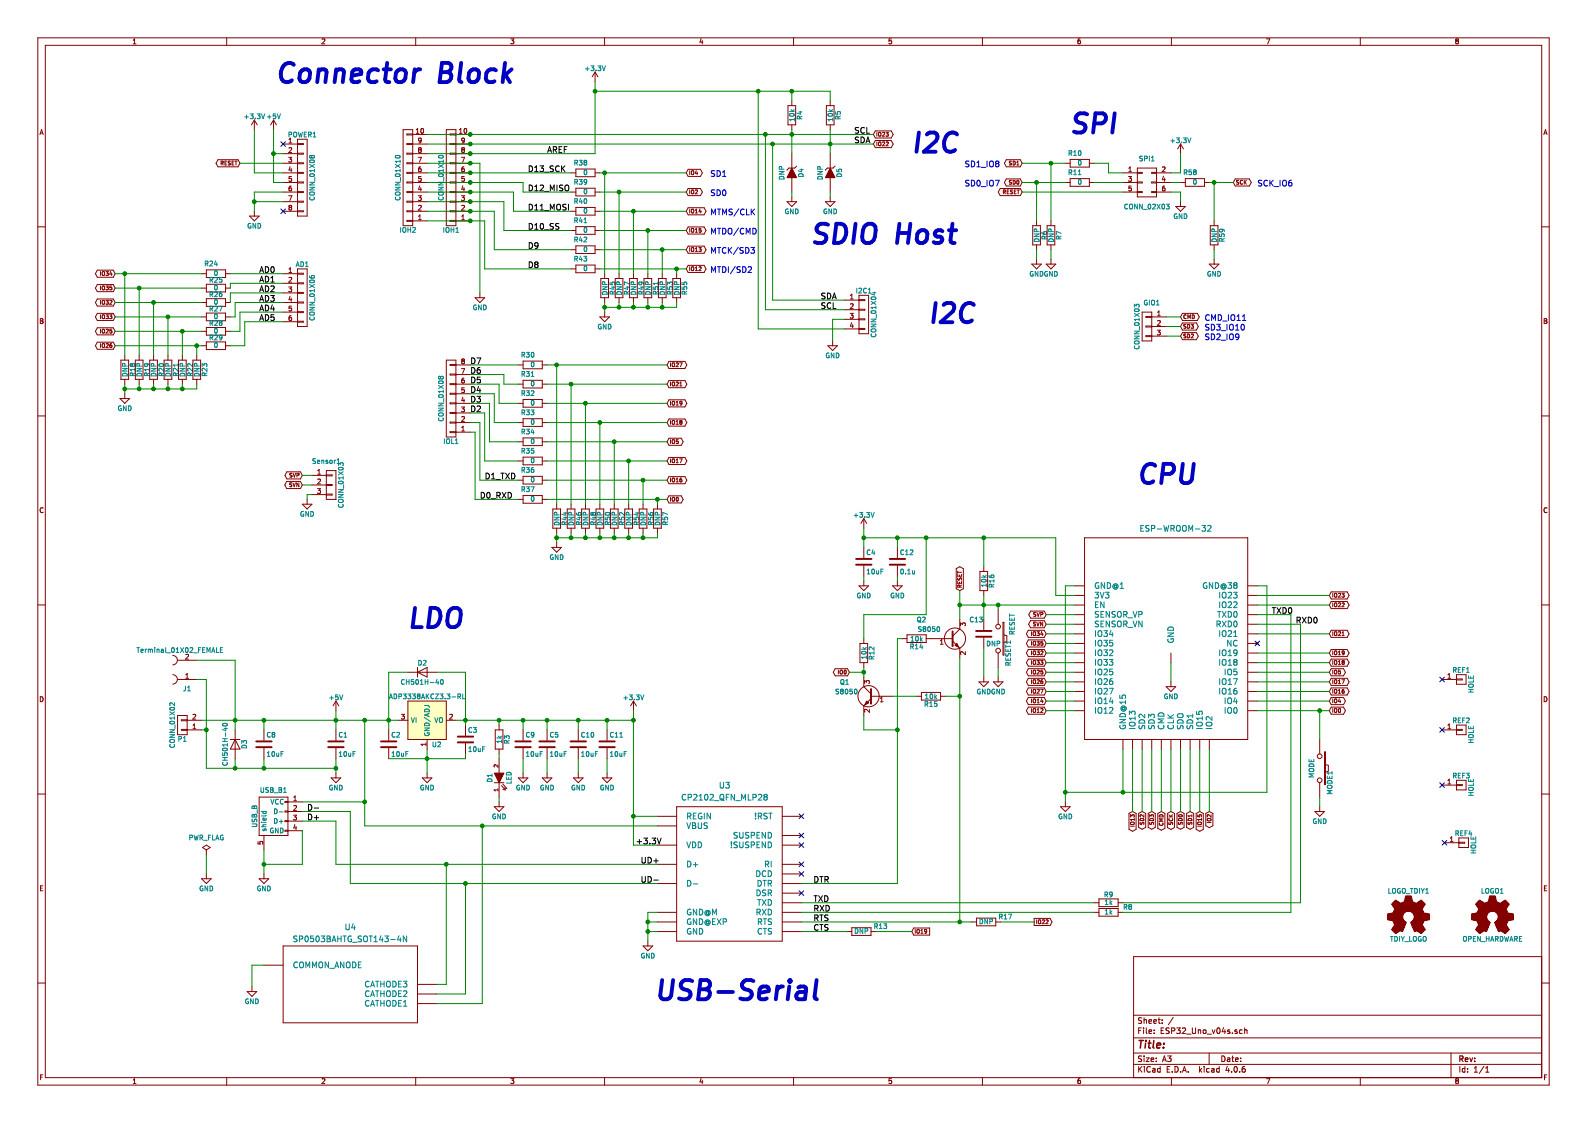 Diagram Taco Sr504 Wiring Diagram Full Version Hd Quality Wiring Diagram Diagramdianeu Mairiecellule Fr